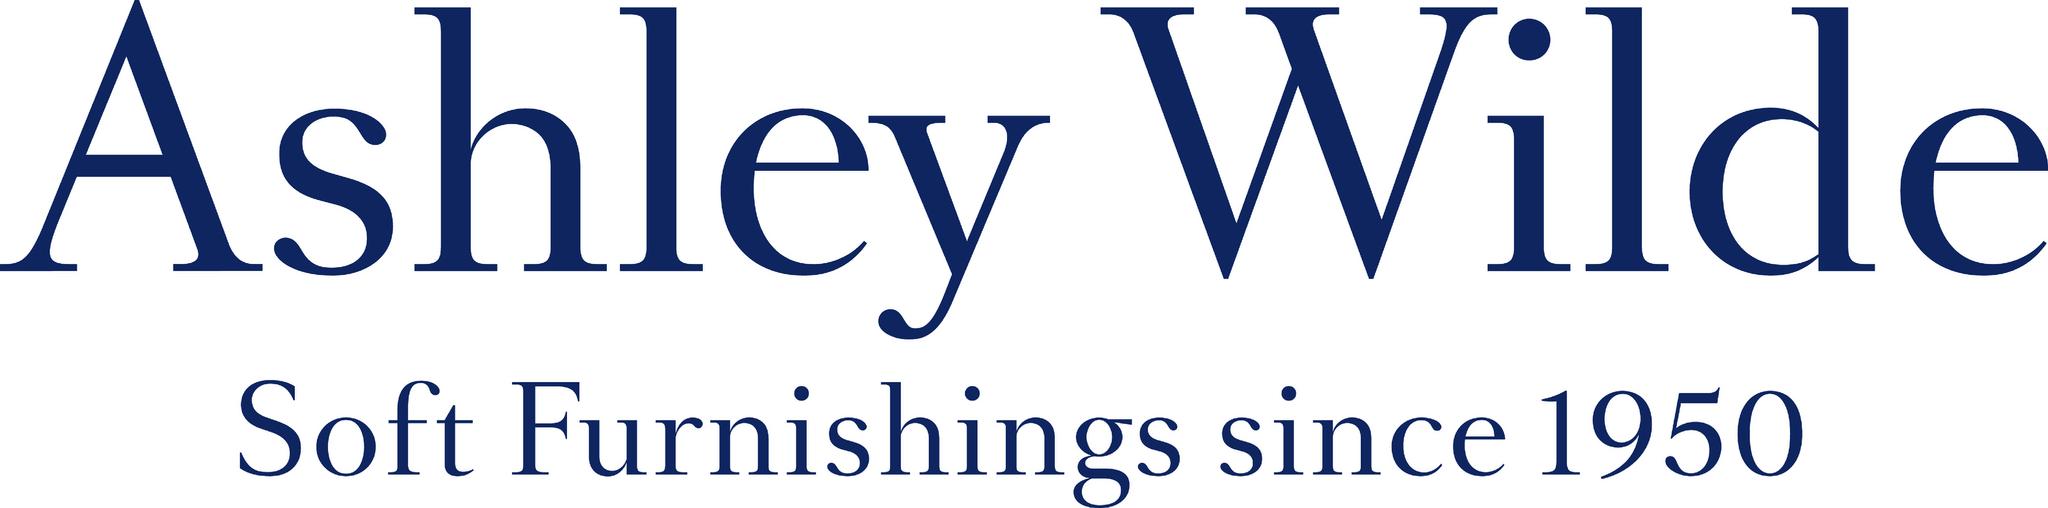 Ashley Wilde Group